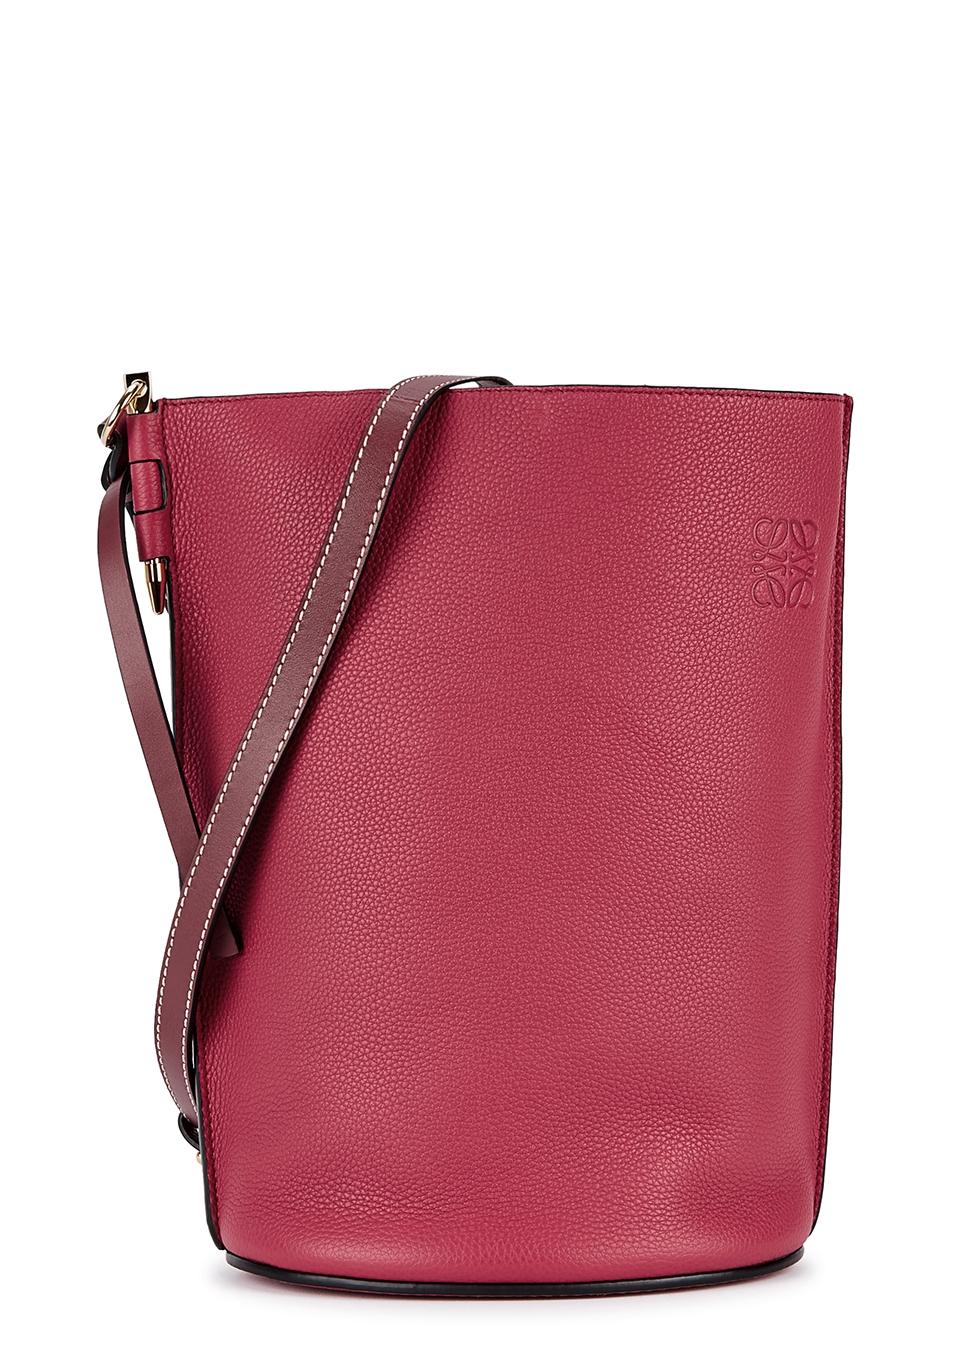 279575190741 Women s Designer Bags